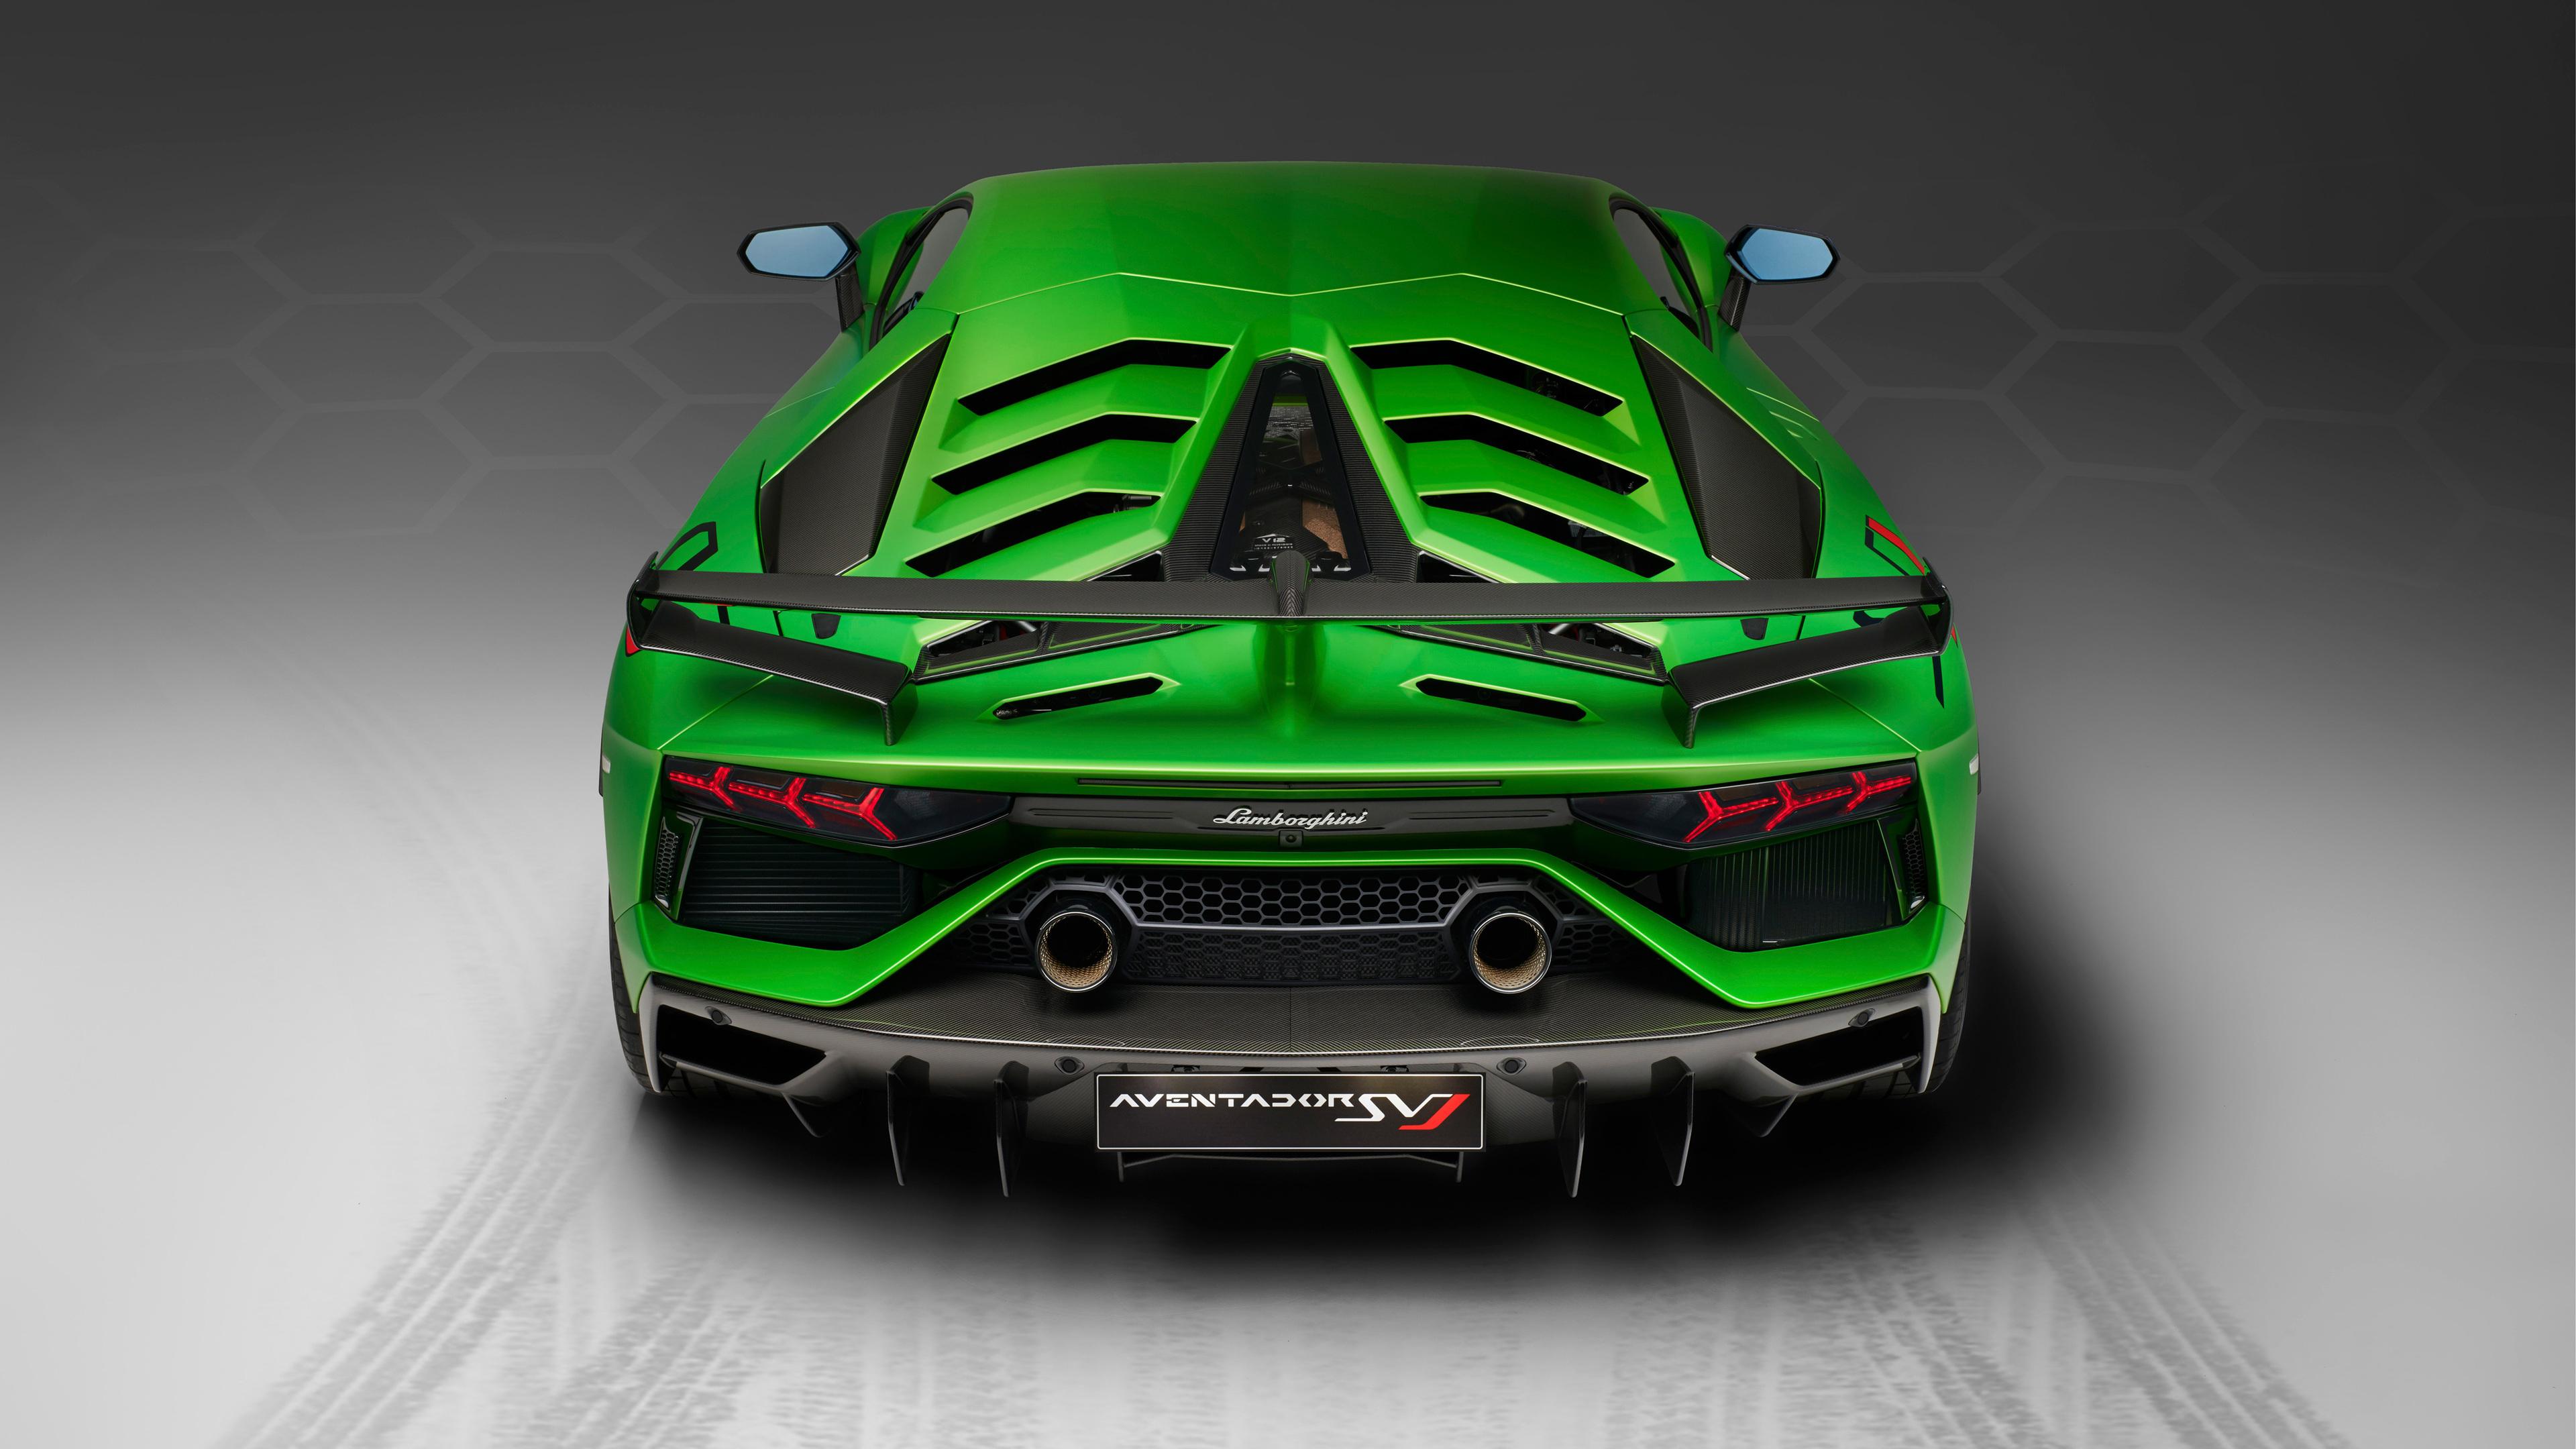 2018 lamborghini aventador svj rear 1539114024 - 2018 Lamborghini Aventador SVJ Rear - lamborghini wallpapers, lamborghini aventador wallpapers, lamborghini aventador svj wallpapers, hd-wallpapers, cars wallpapers, 4k-wallpapers, 2018 cars wallpapers